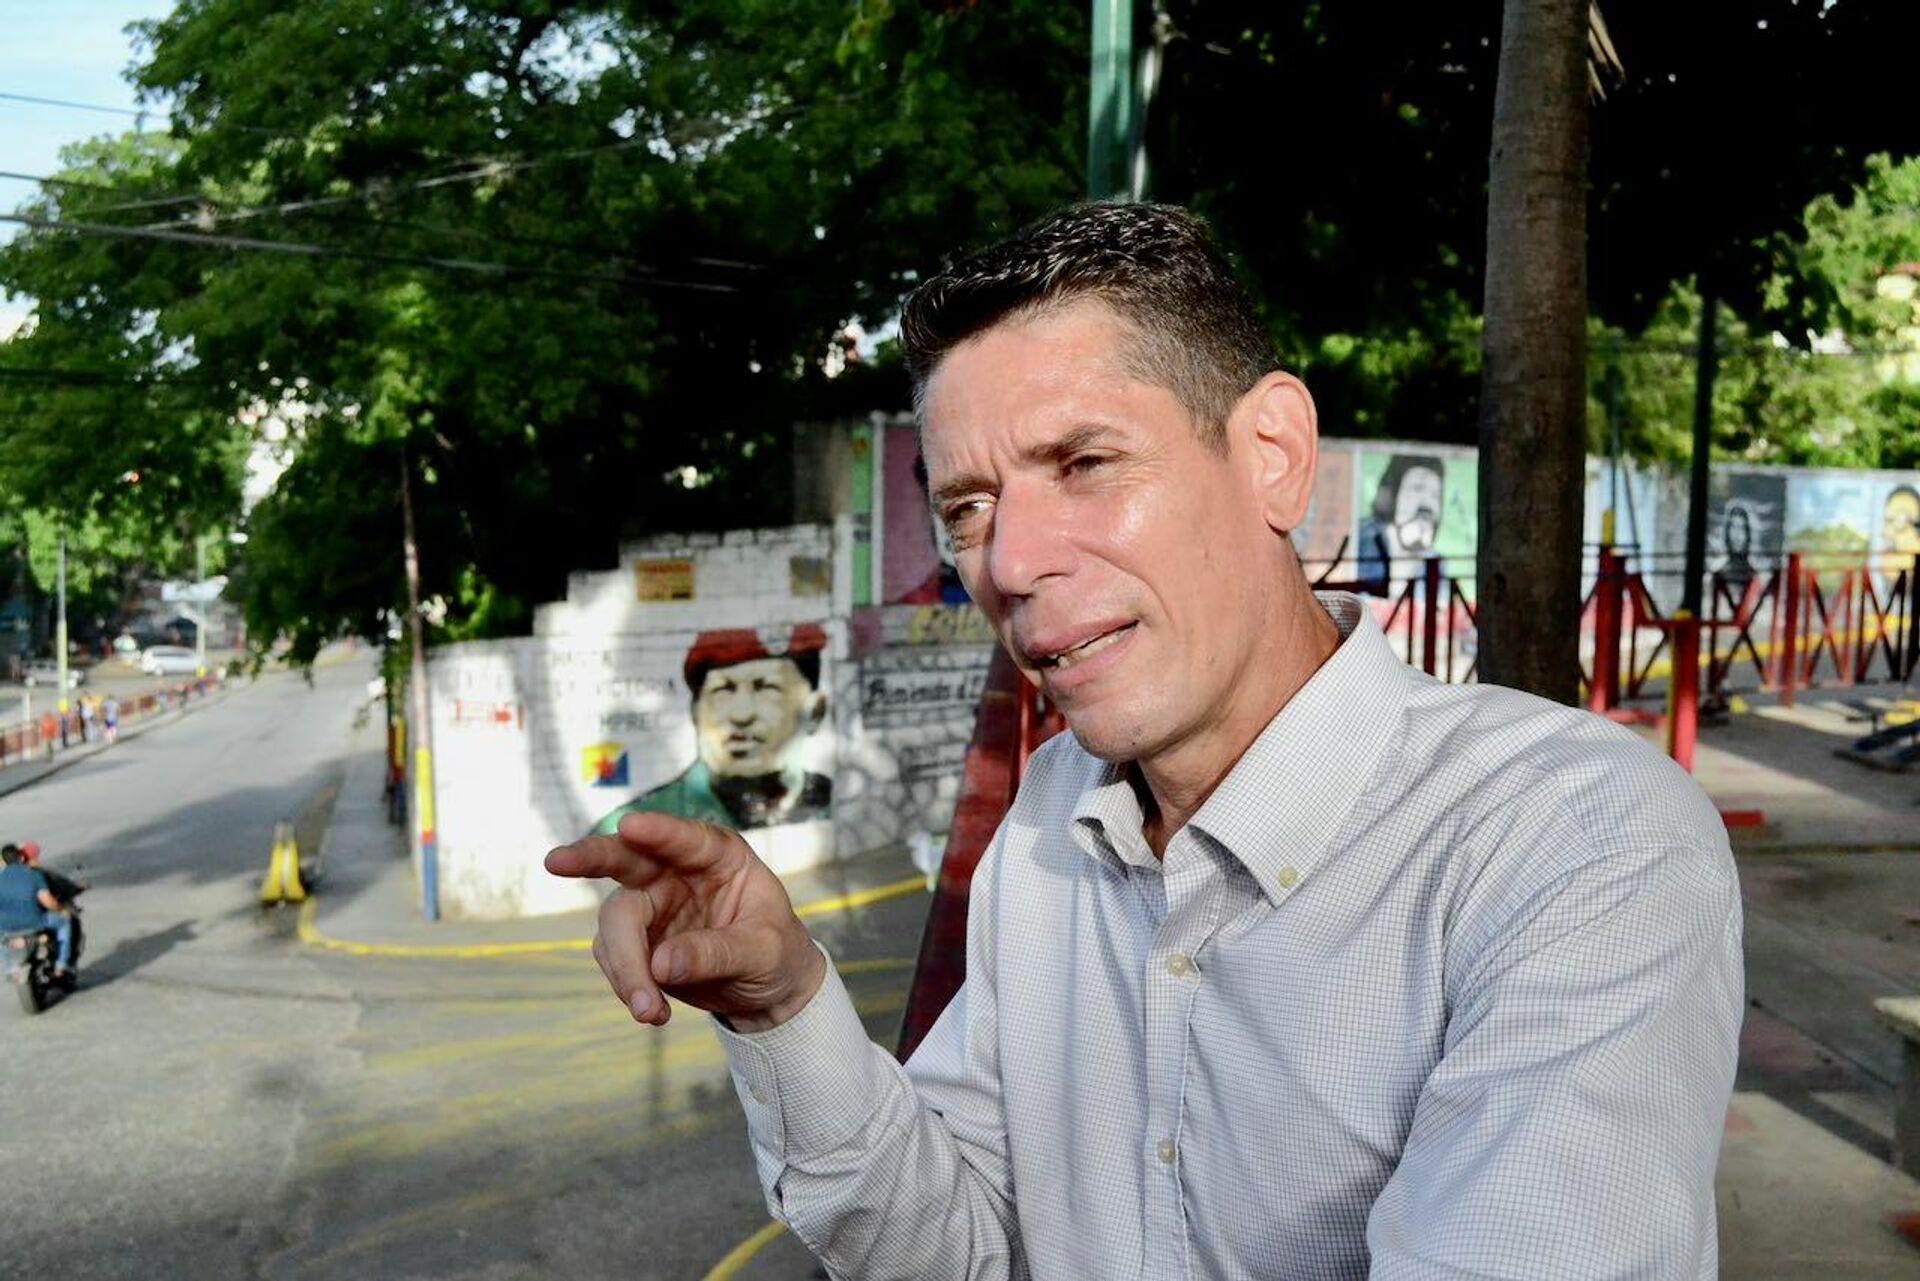 David Pulido, líder del colectivo del 23 de Enero Vanguardia Zamorana: Tenemos un sistema popular de alerta temprana - Sputnik Mundo, 1920, 23.07.2021